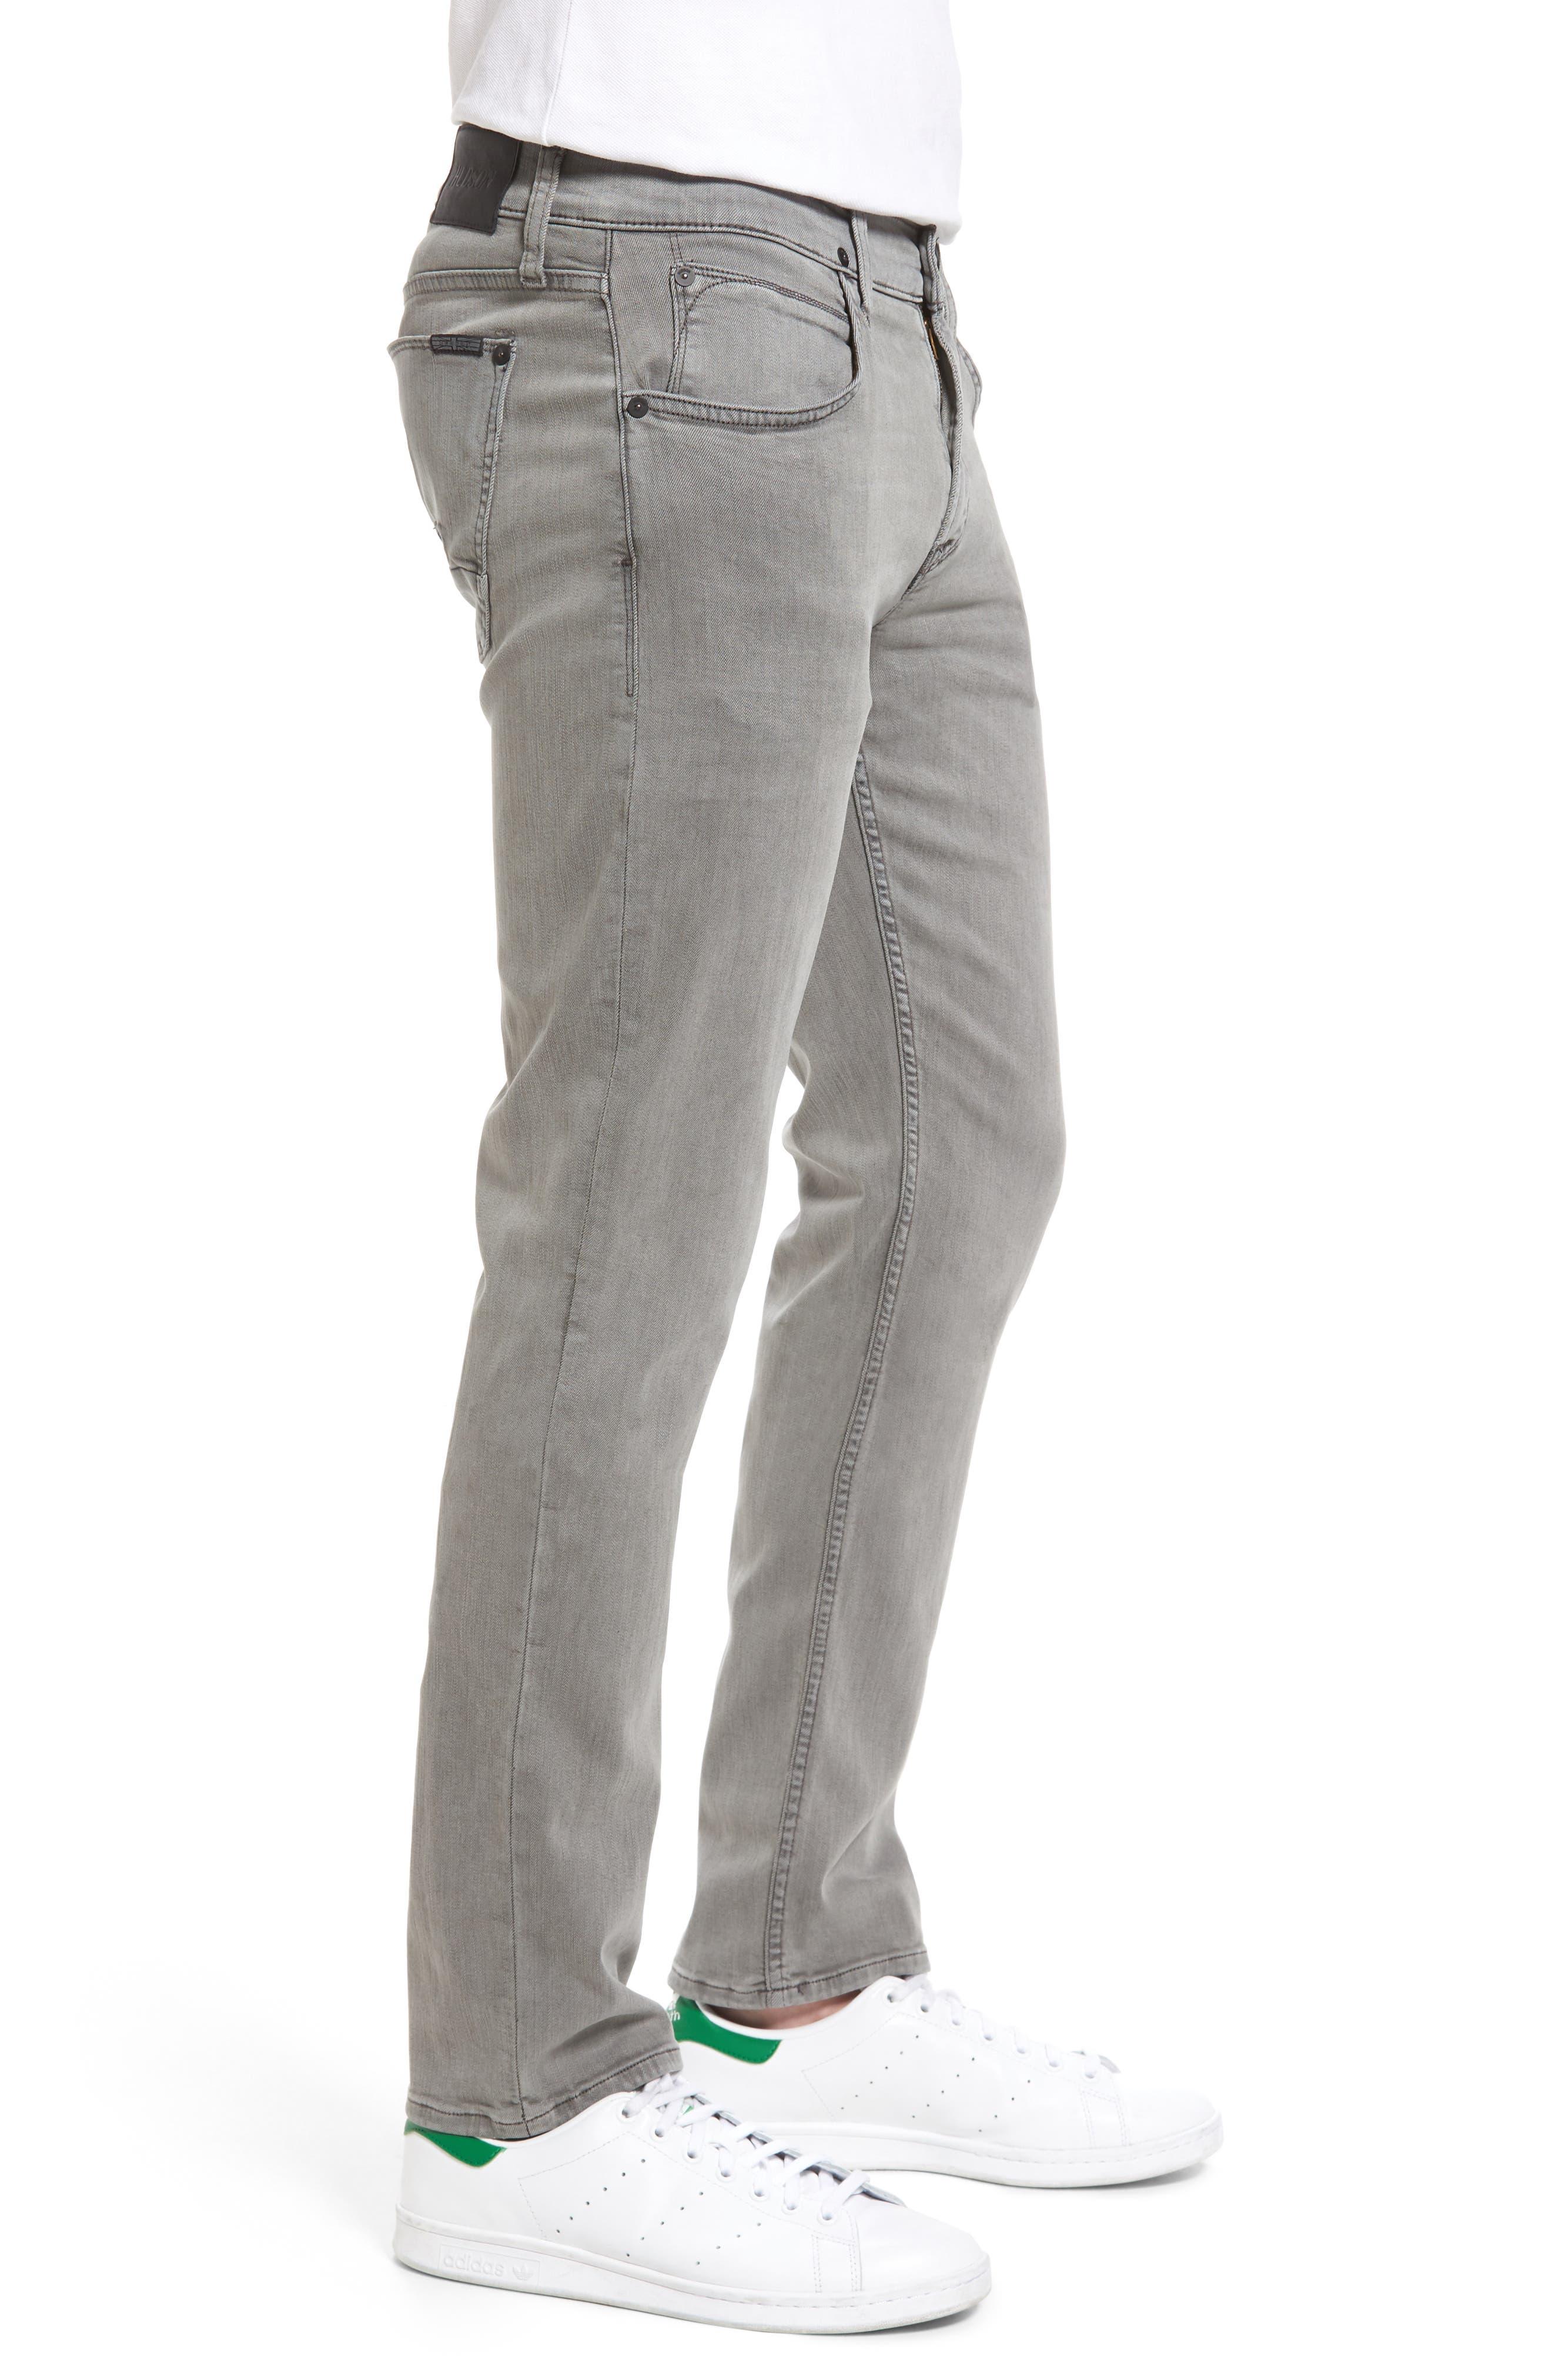 Blake Slim Fit Jeans,                             Alternate thumbnail 3, color,                             023